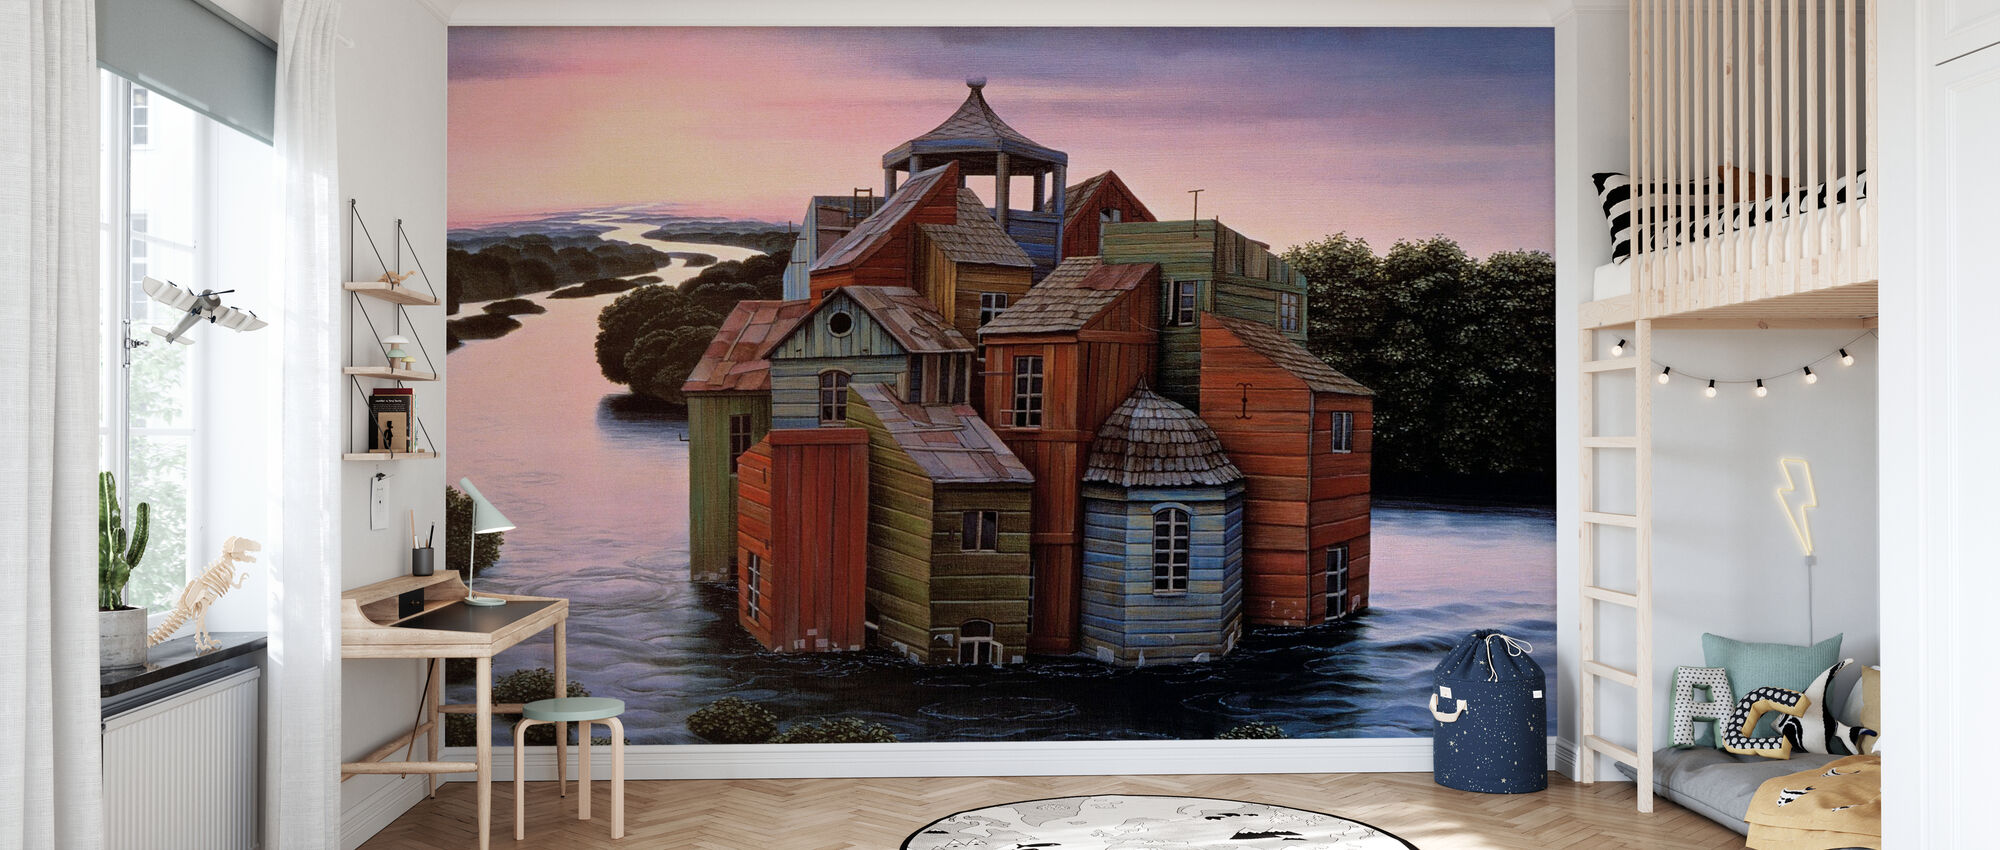 Fallingwater Estate - Tapete - Kinderzimmer